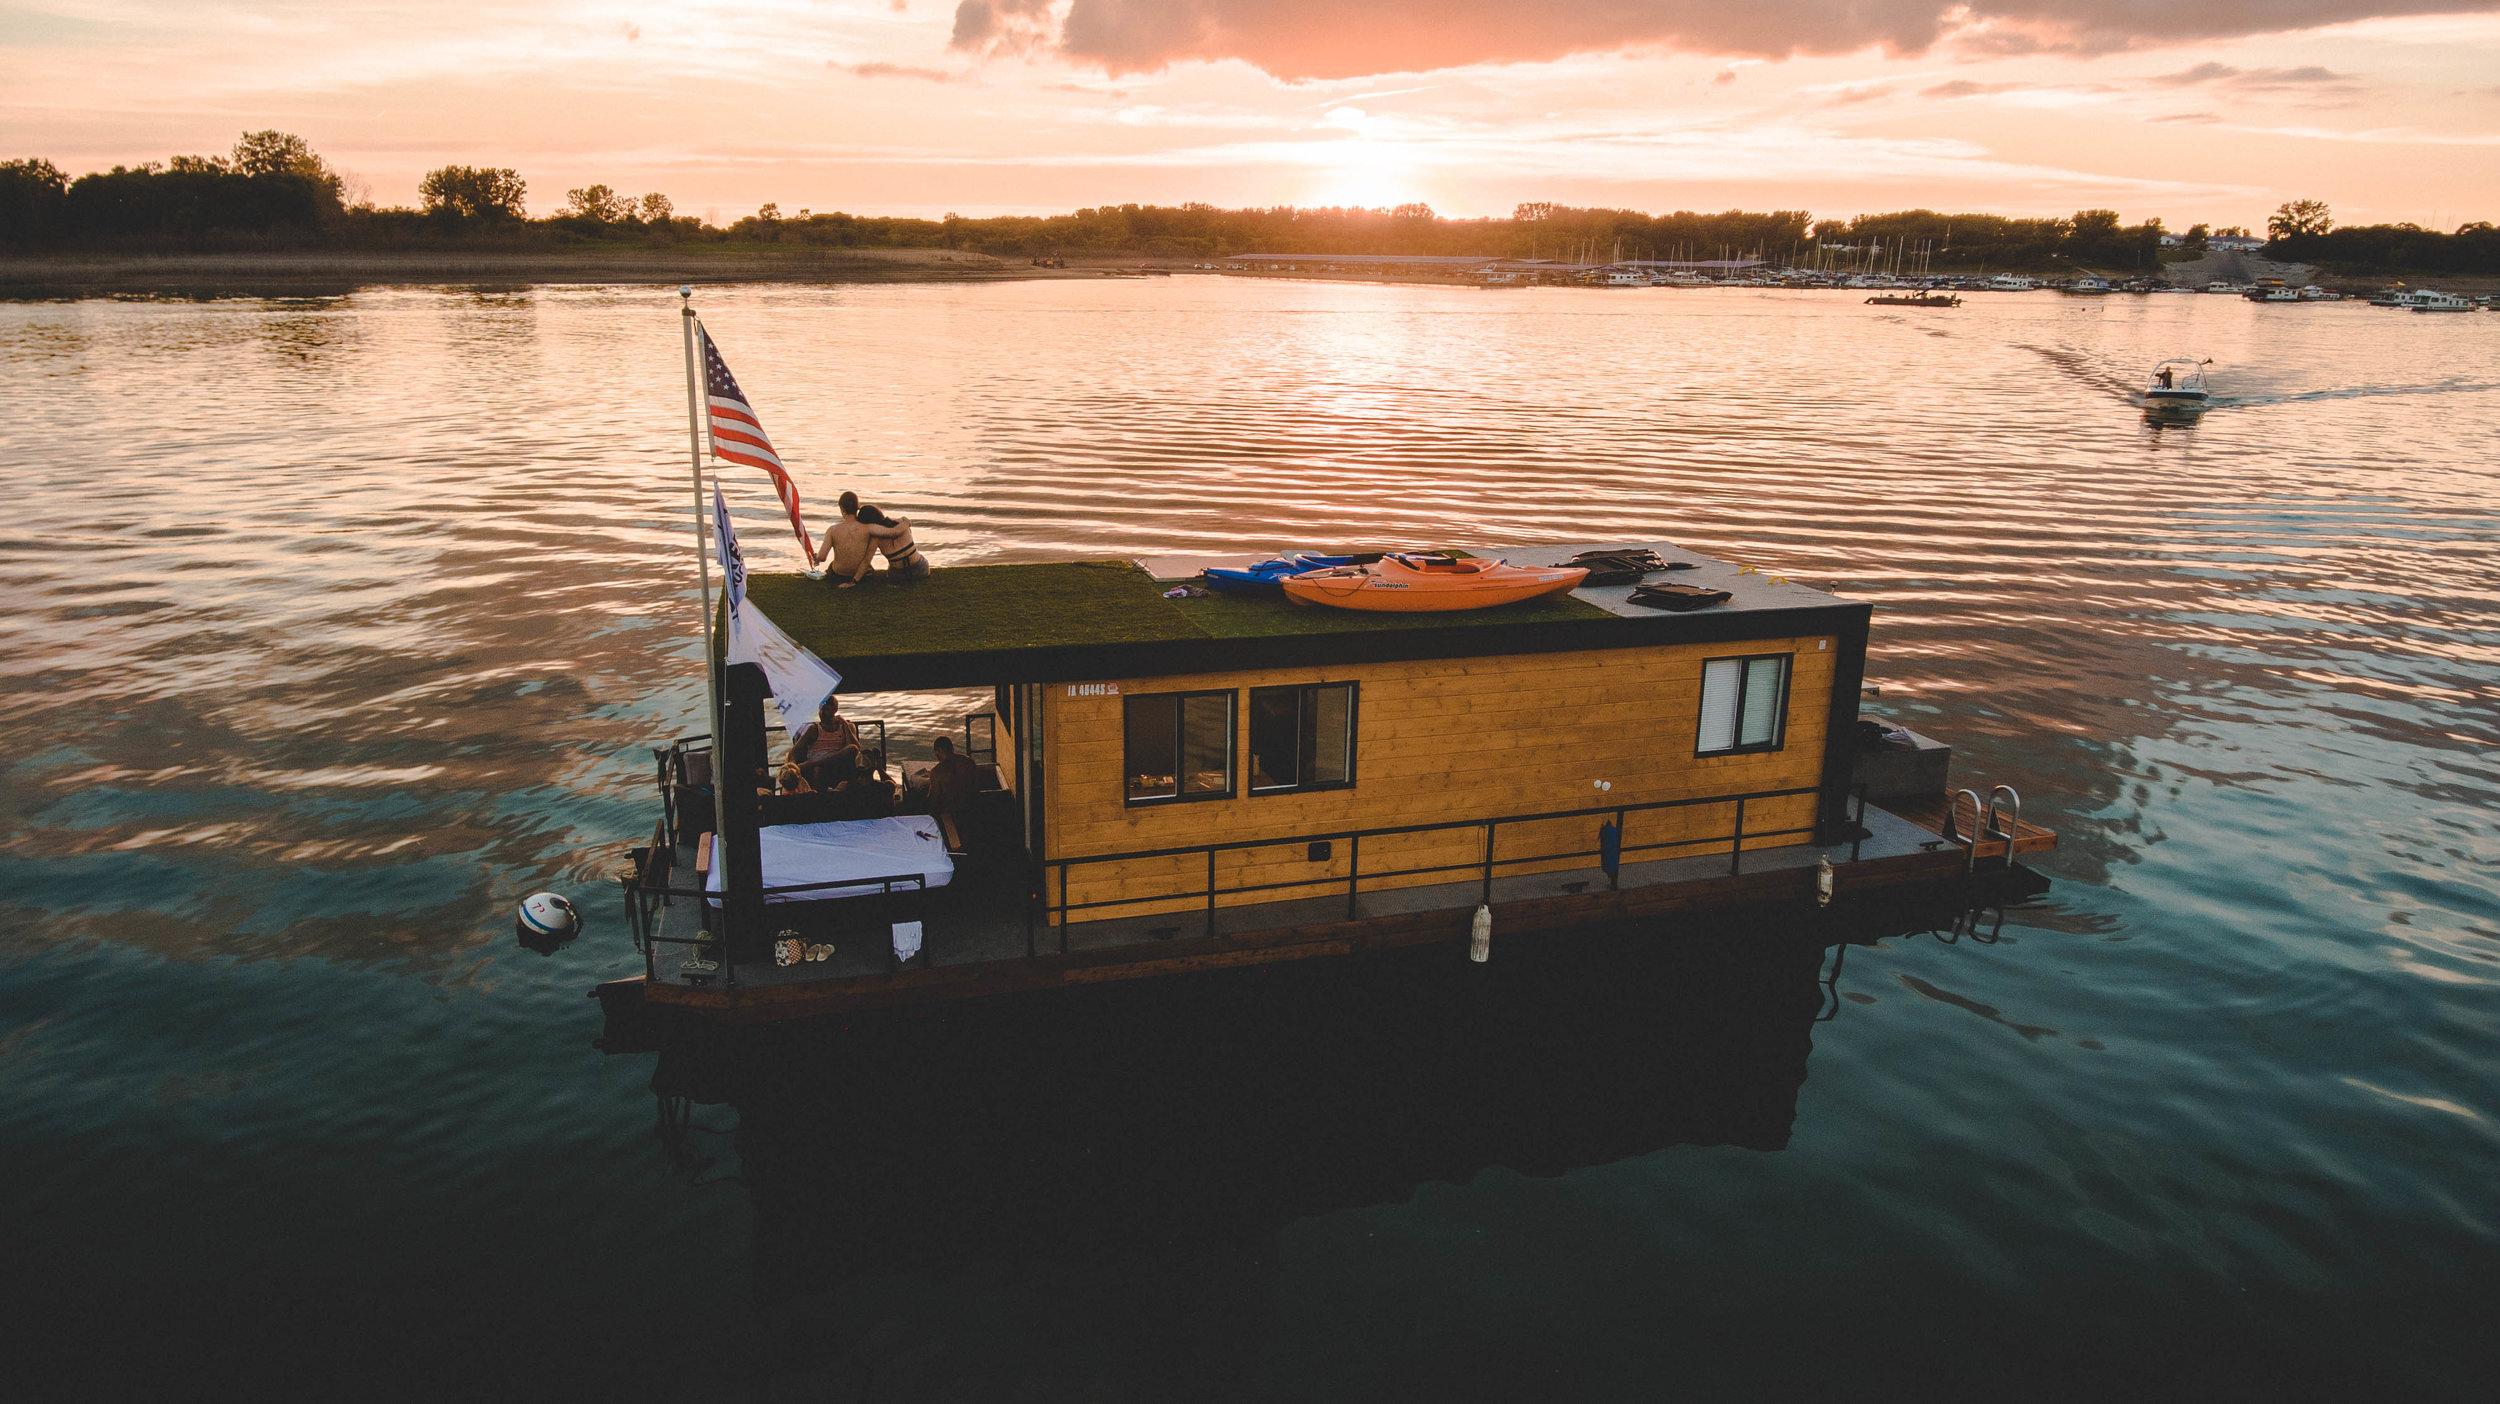 House-Boat-Day1-8.jpg